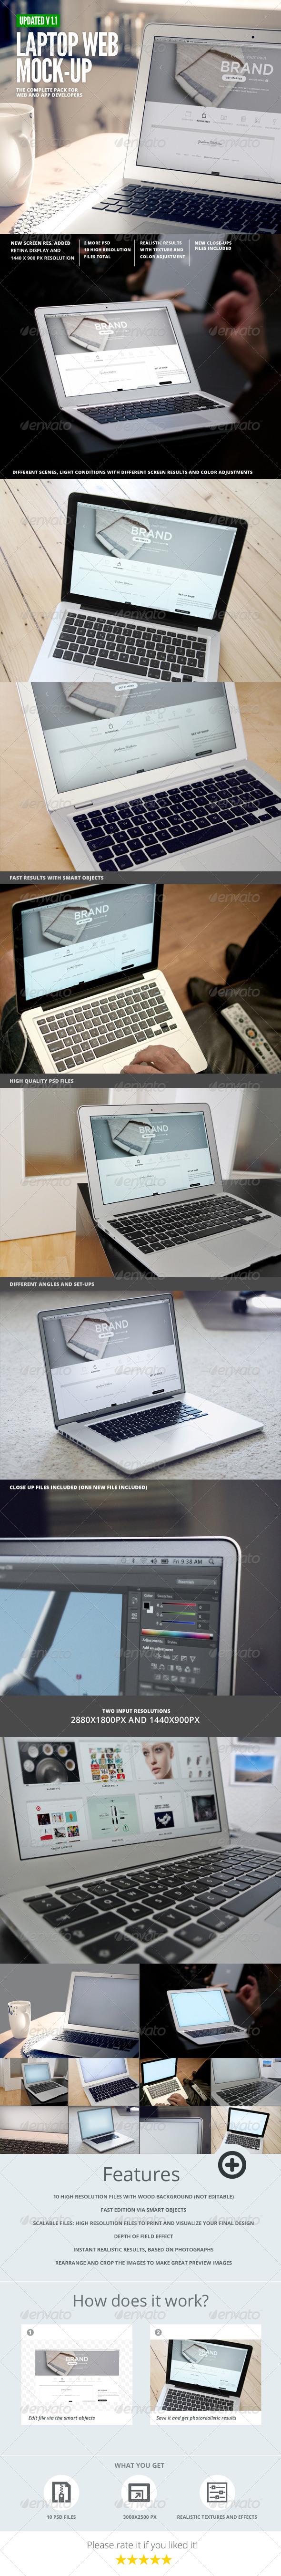 Laptop | Web App Mock-Up - Laptop Displays